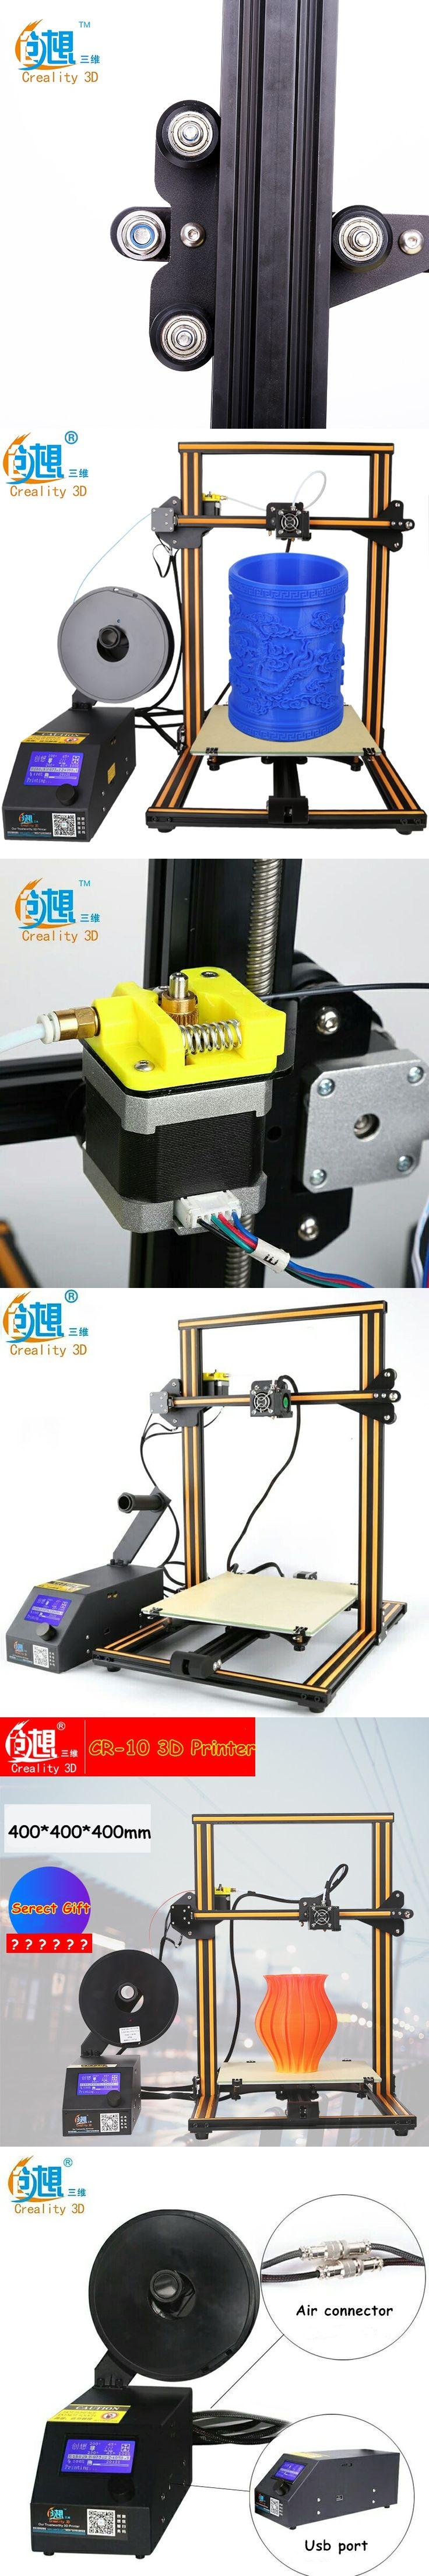 Free Shipping 2017 Newest 3 D Metal Printer Creality CR-10 Big Print Size 400*400*400mm DIY 3D Printer Kit With Free Filaments